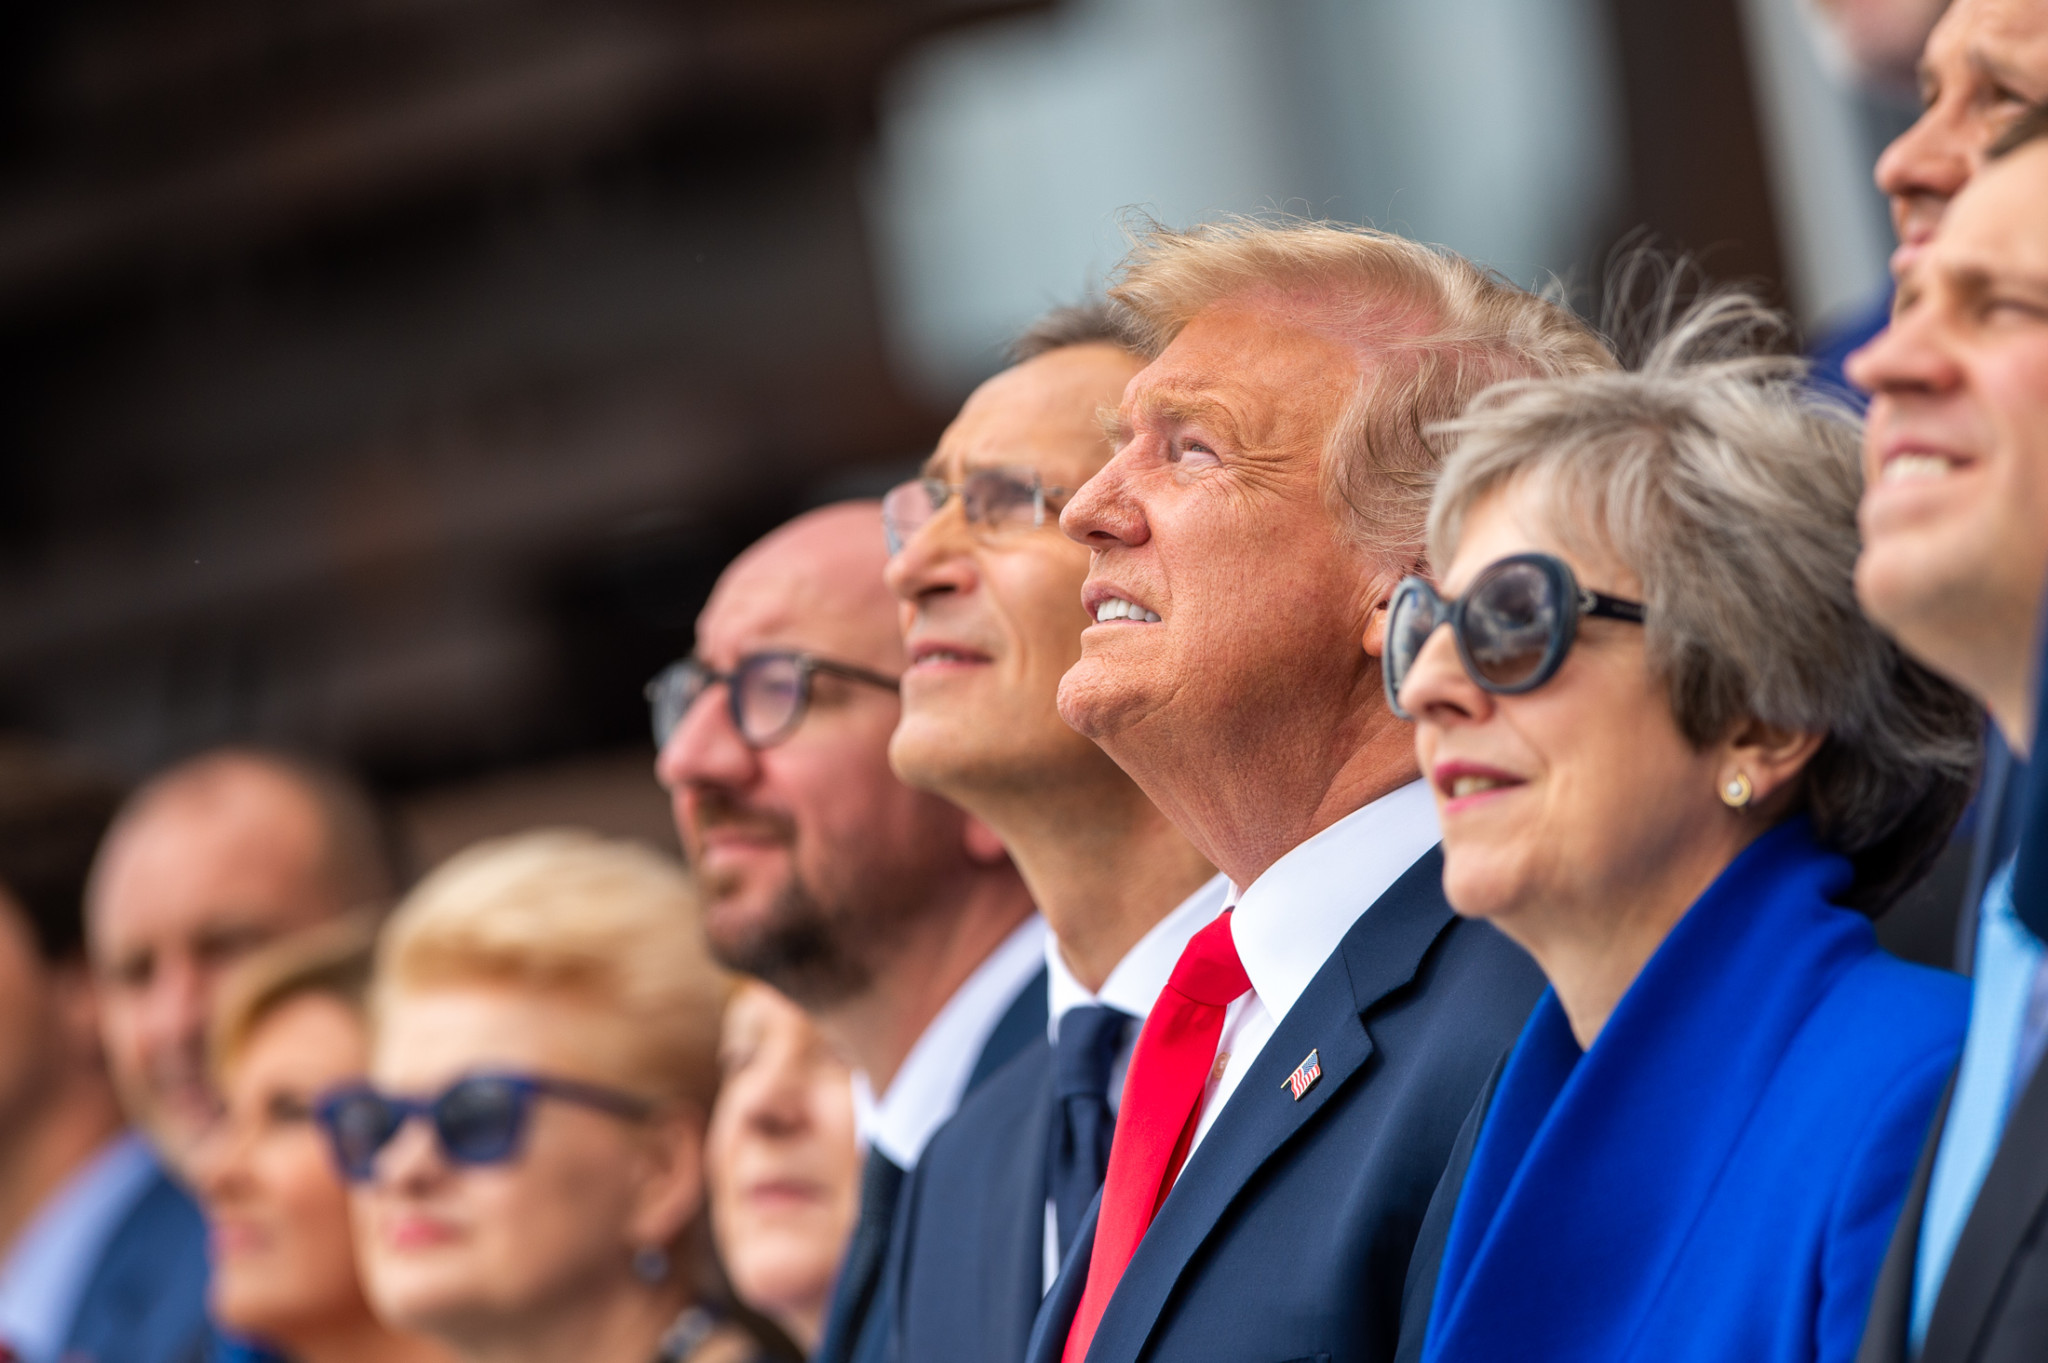 NATO gir Trump spesialtilpassede tall